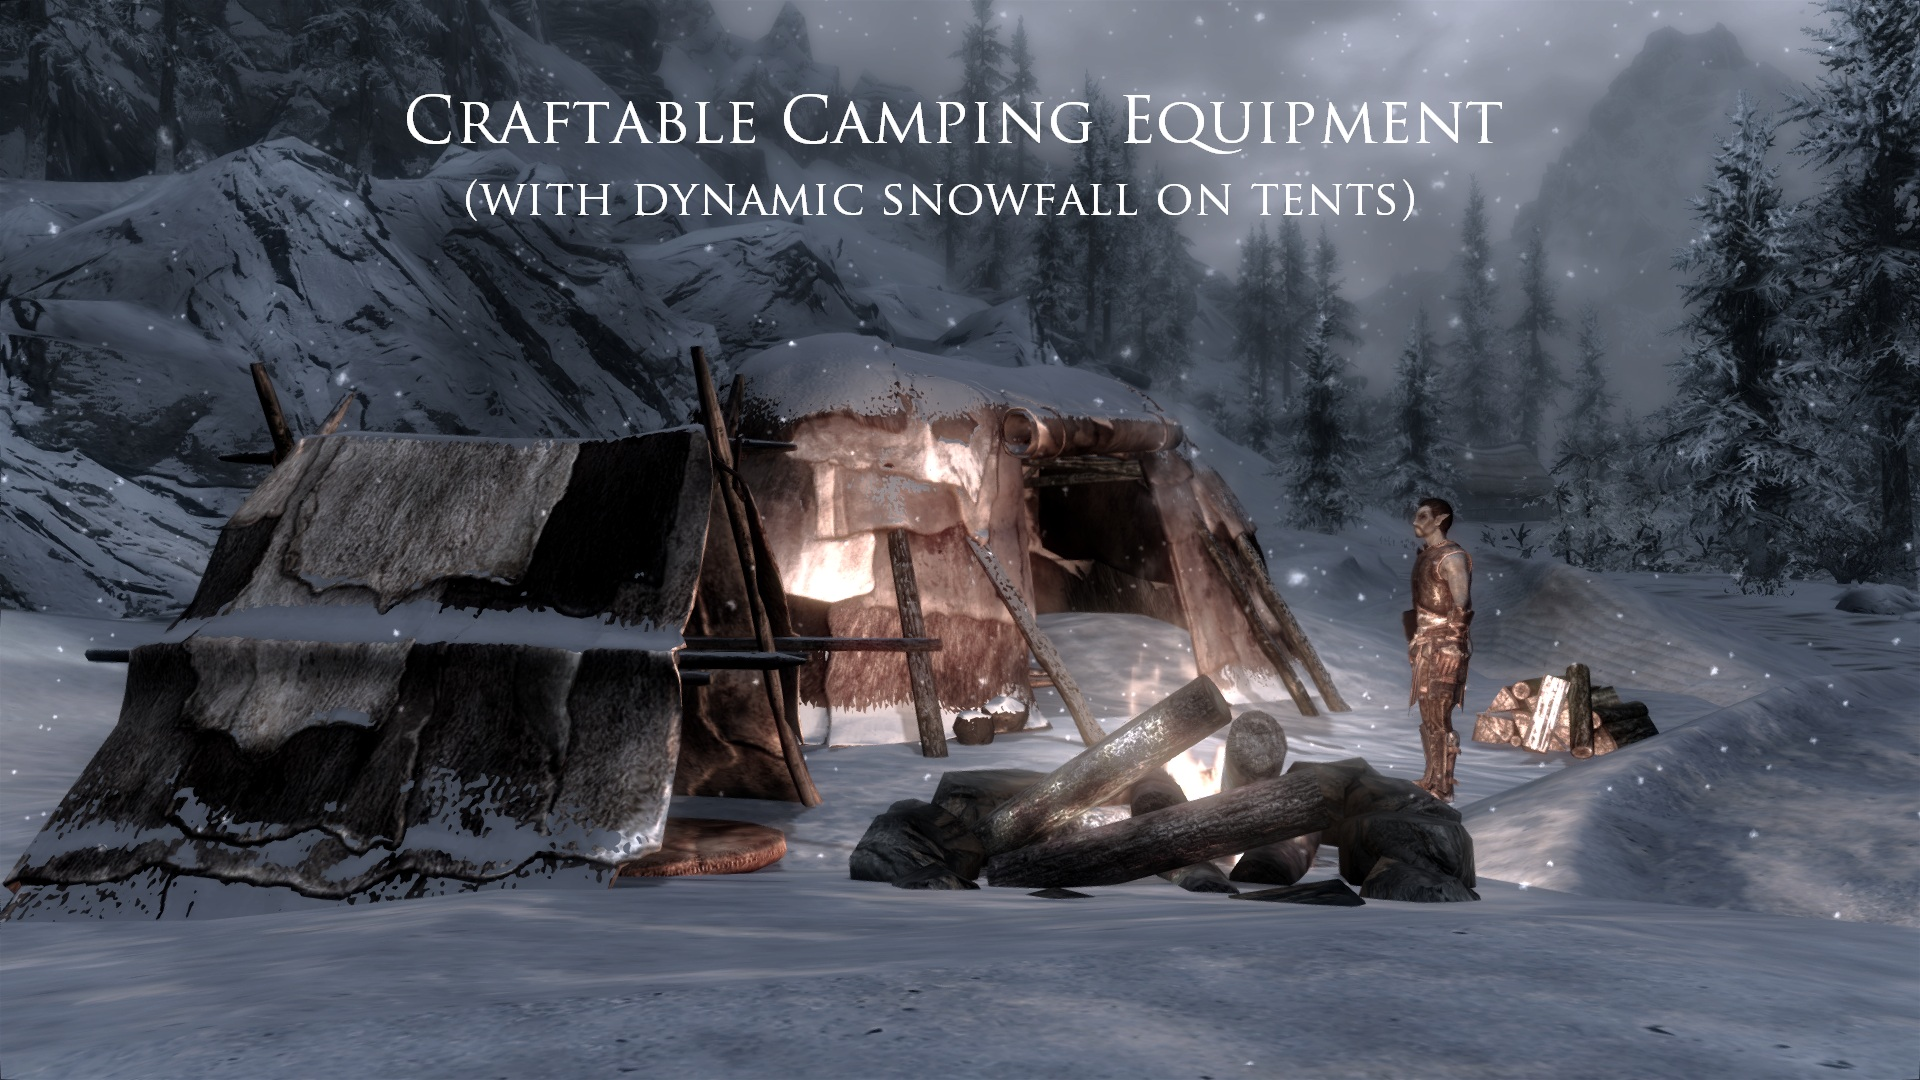 Skyrim SE: Frostfall - Hypothermia Camping Survival